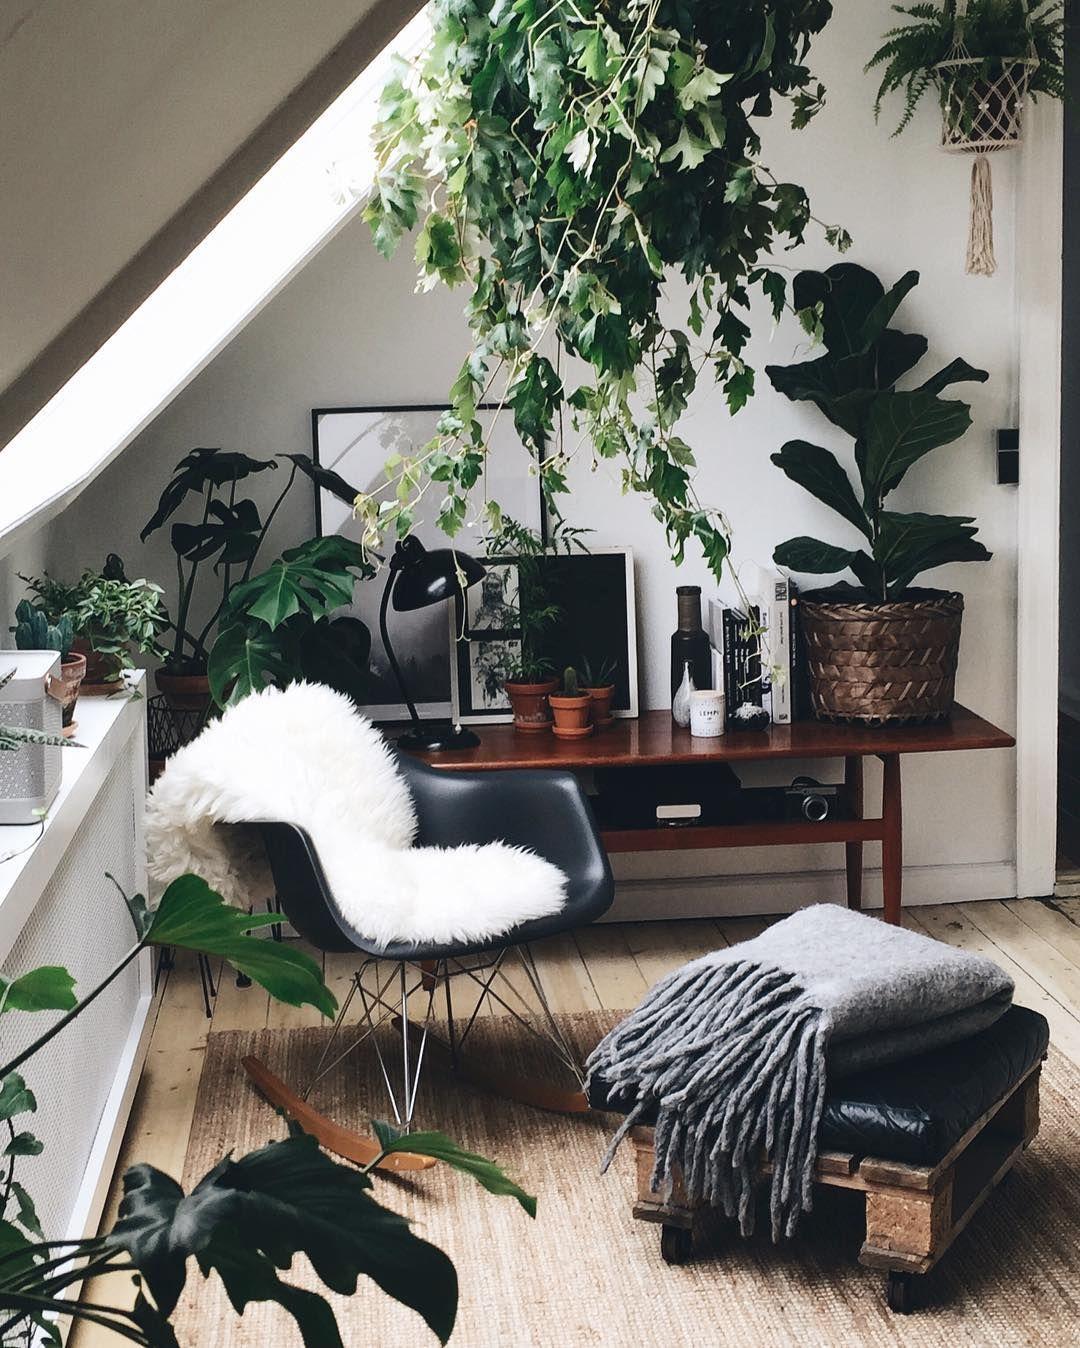 Boho urban jungle woonkamer met kuipstoel | Addicted to Plants ...